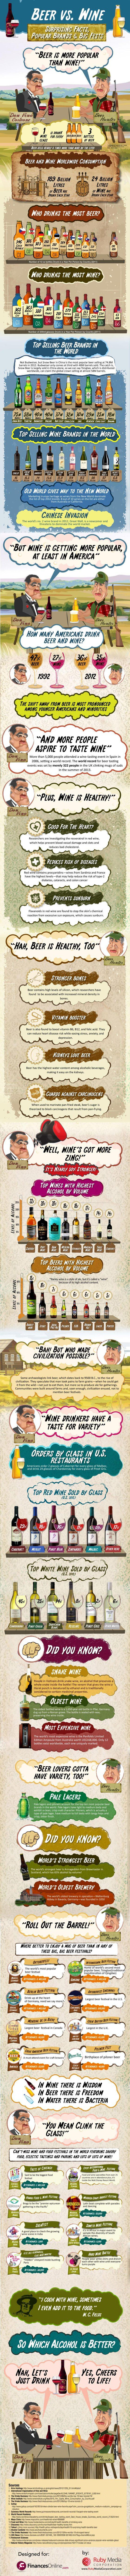 Beer vs. Wine: Surprising Facts, Popular Brands & Big Festivals